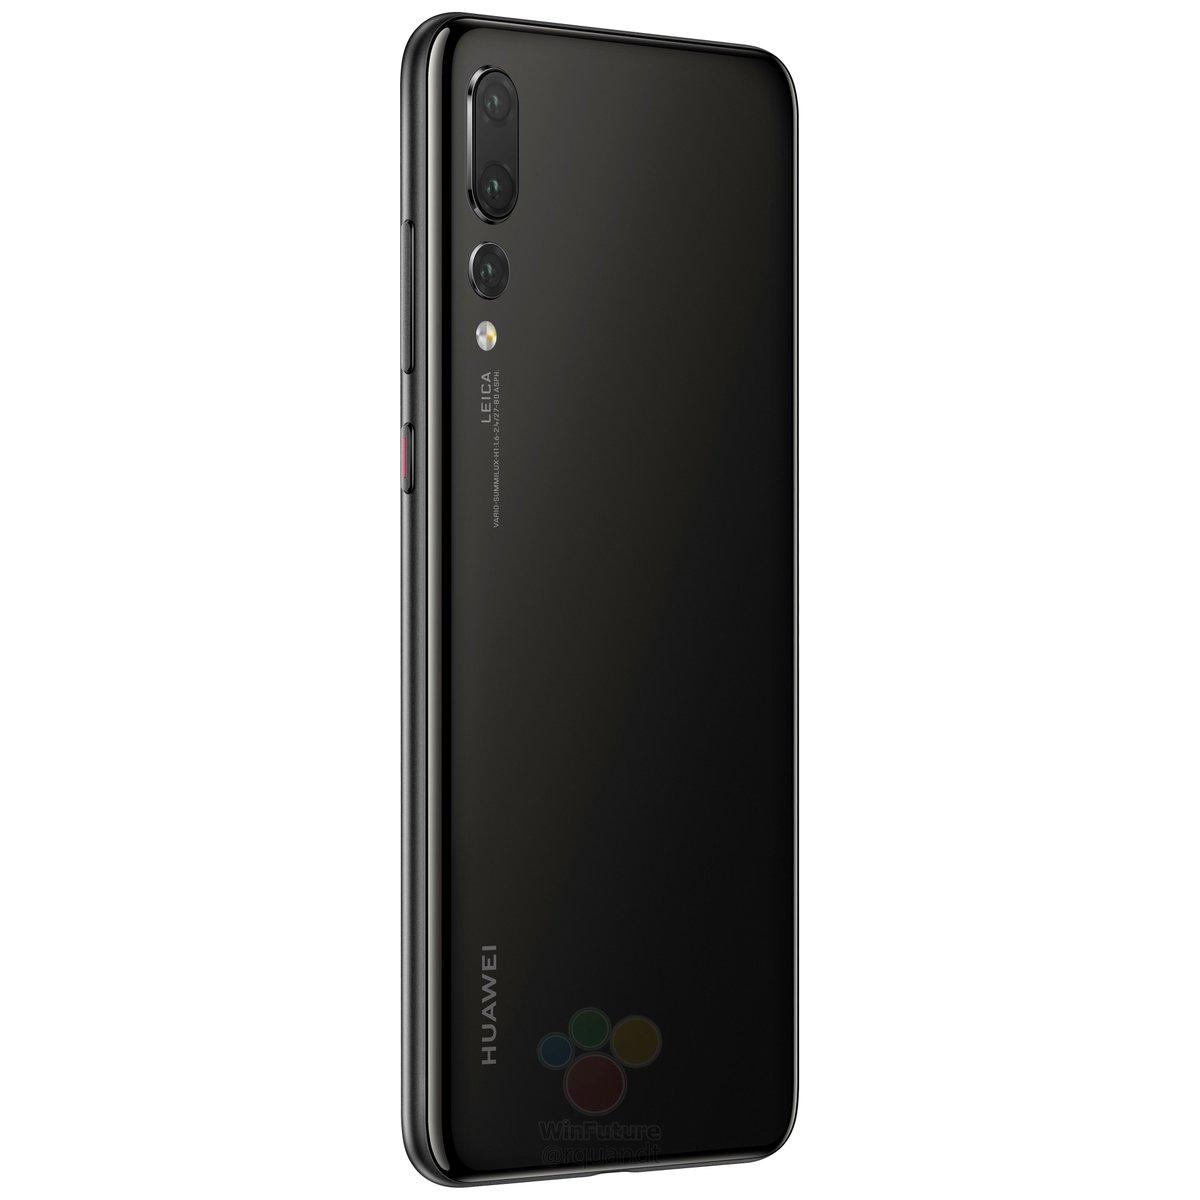 Huawei-P20-Pro-7